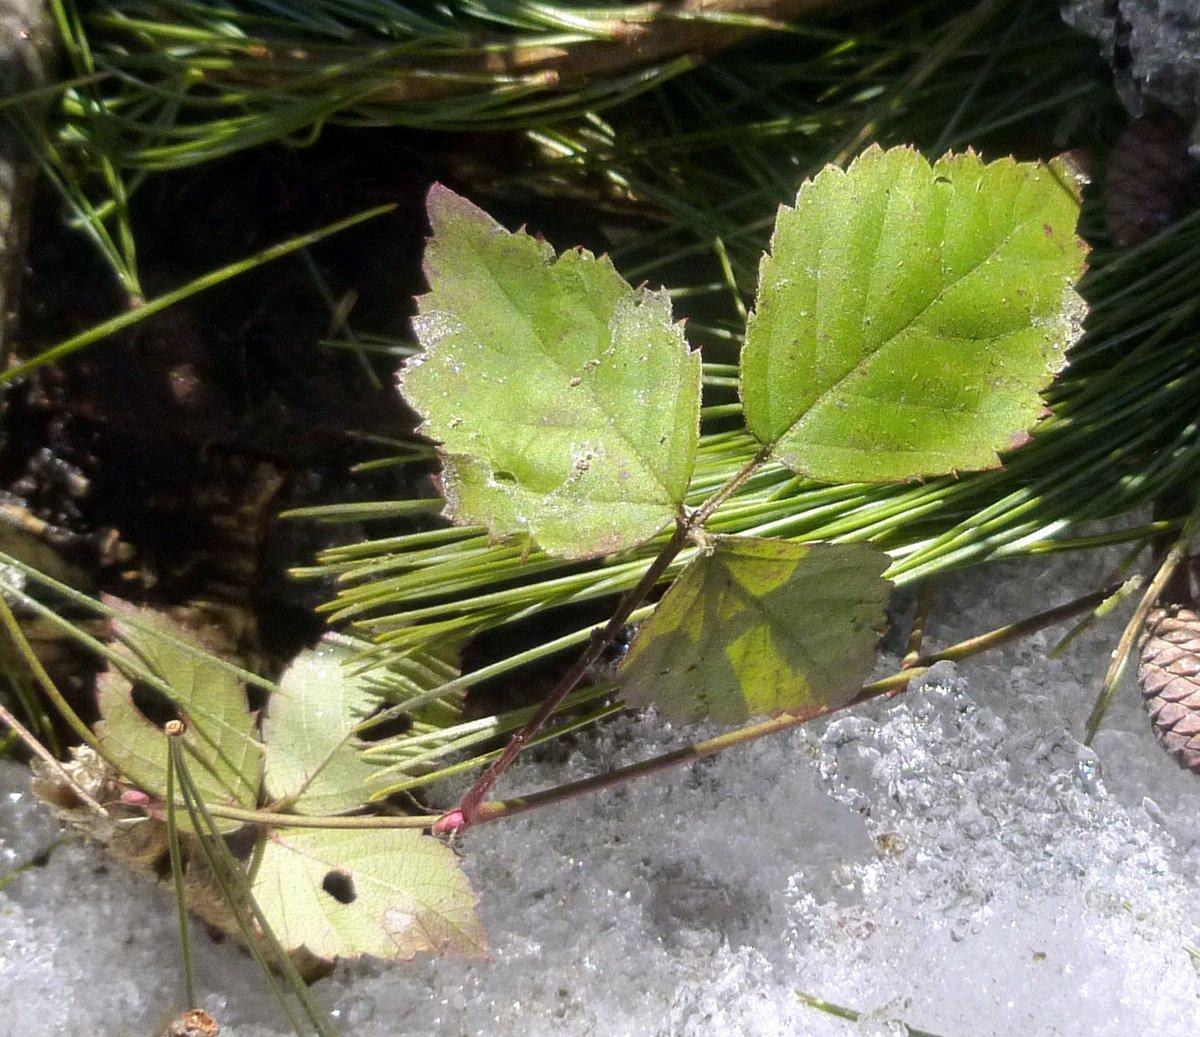 5. Dwarf Raspberry Leaves